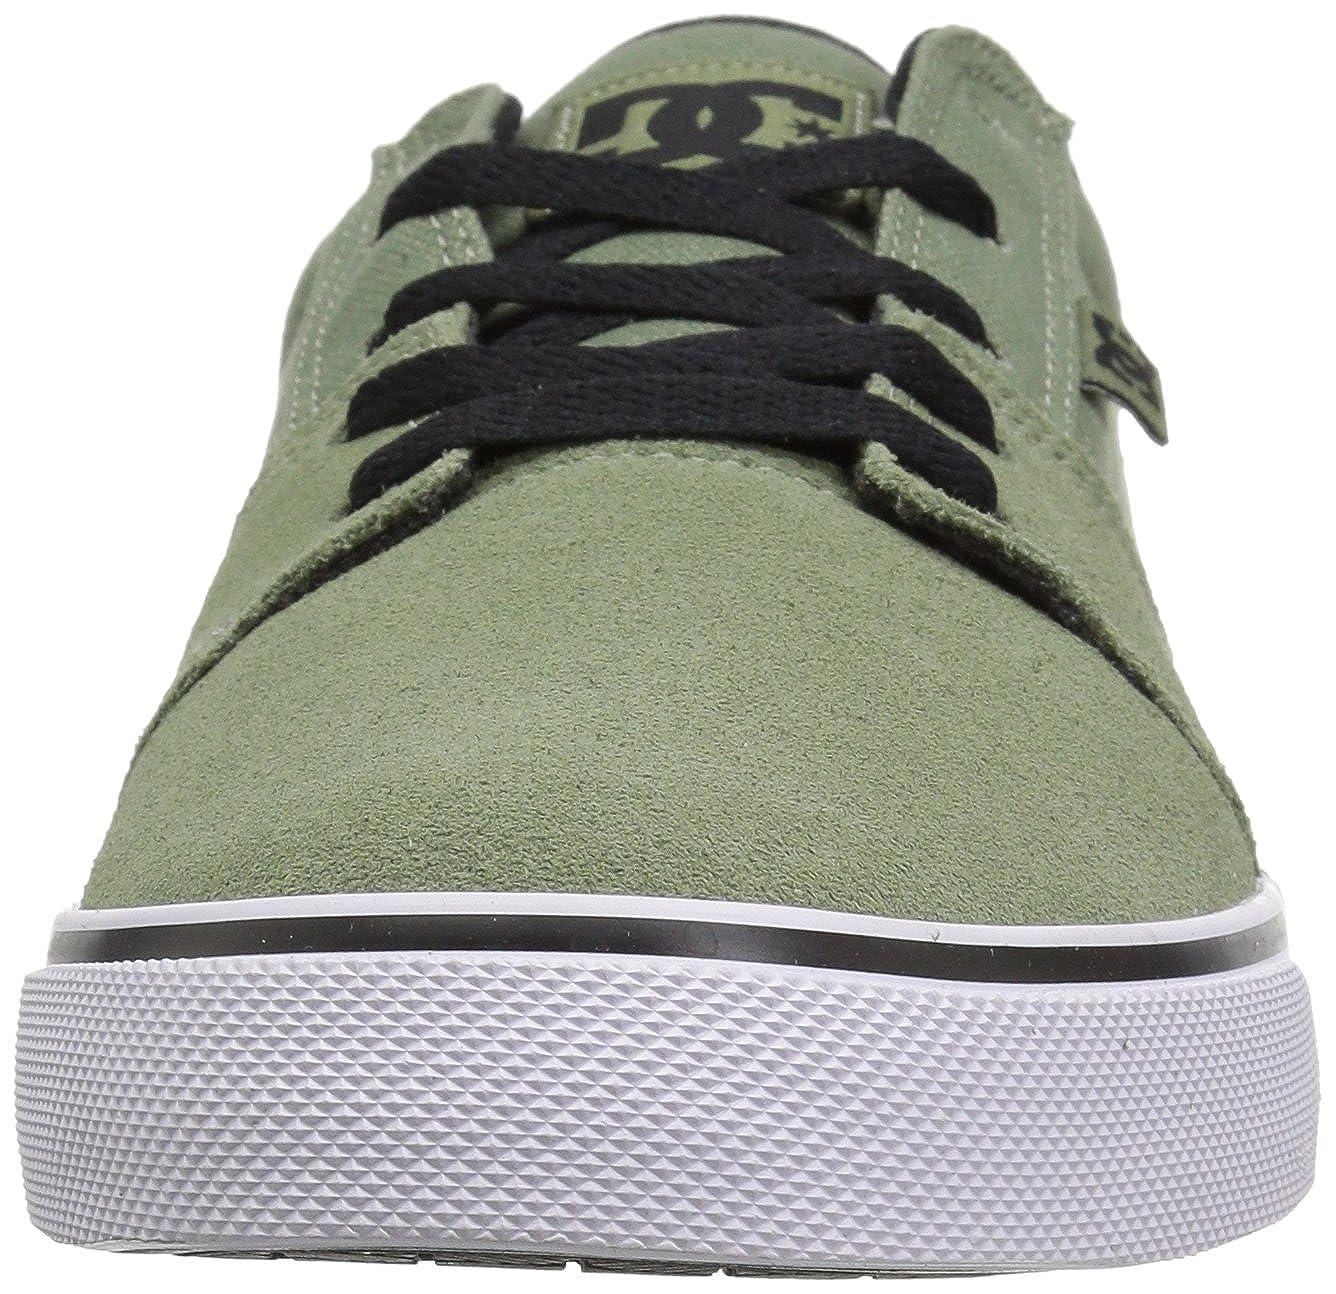 DC scarpe TONIK - Scarpe Scarpe Scarpe da Ginnastica Basse Uomo | Buon design  6987ed